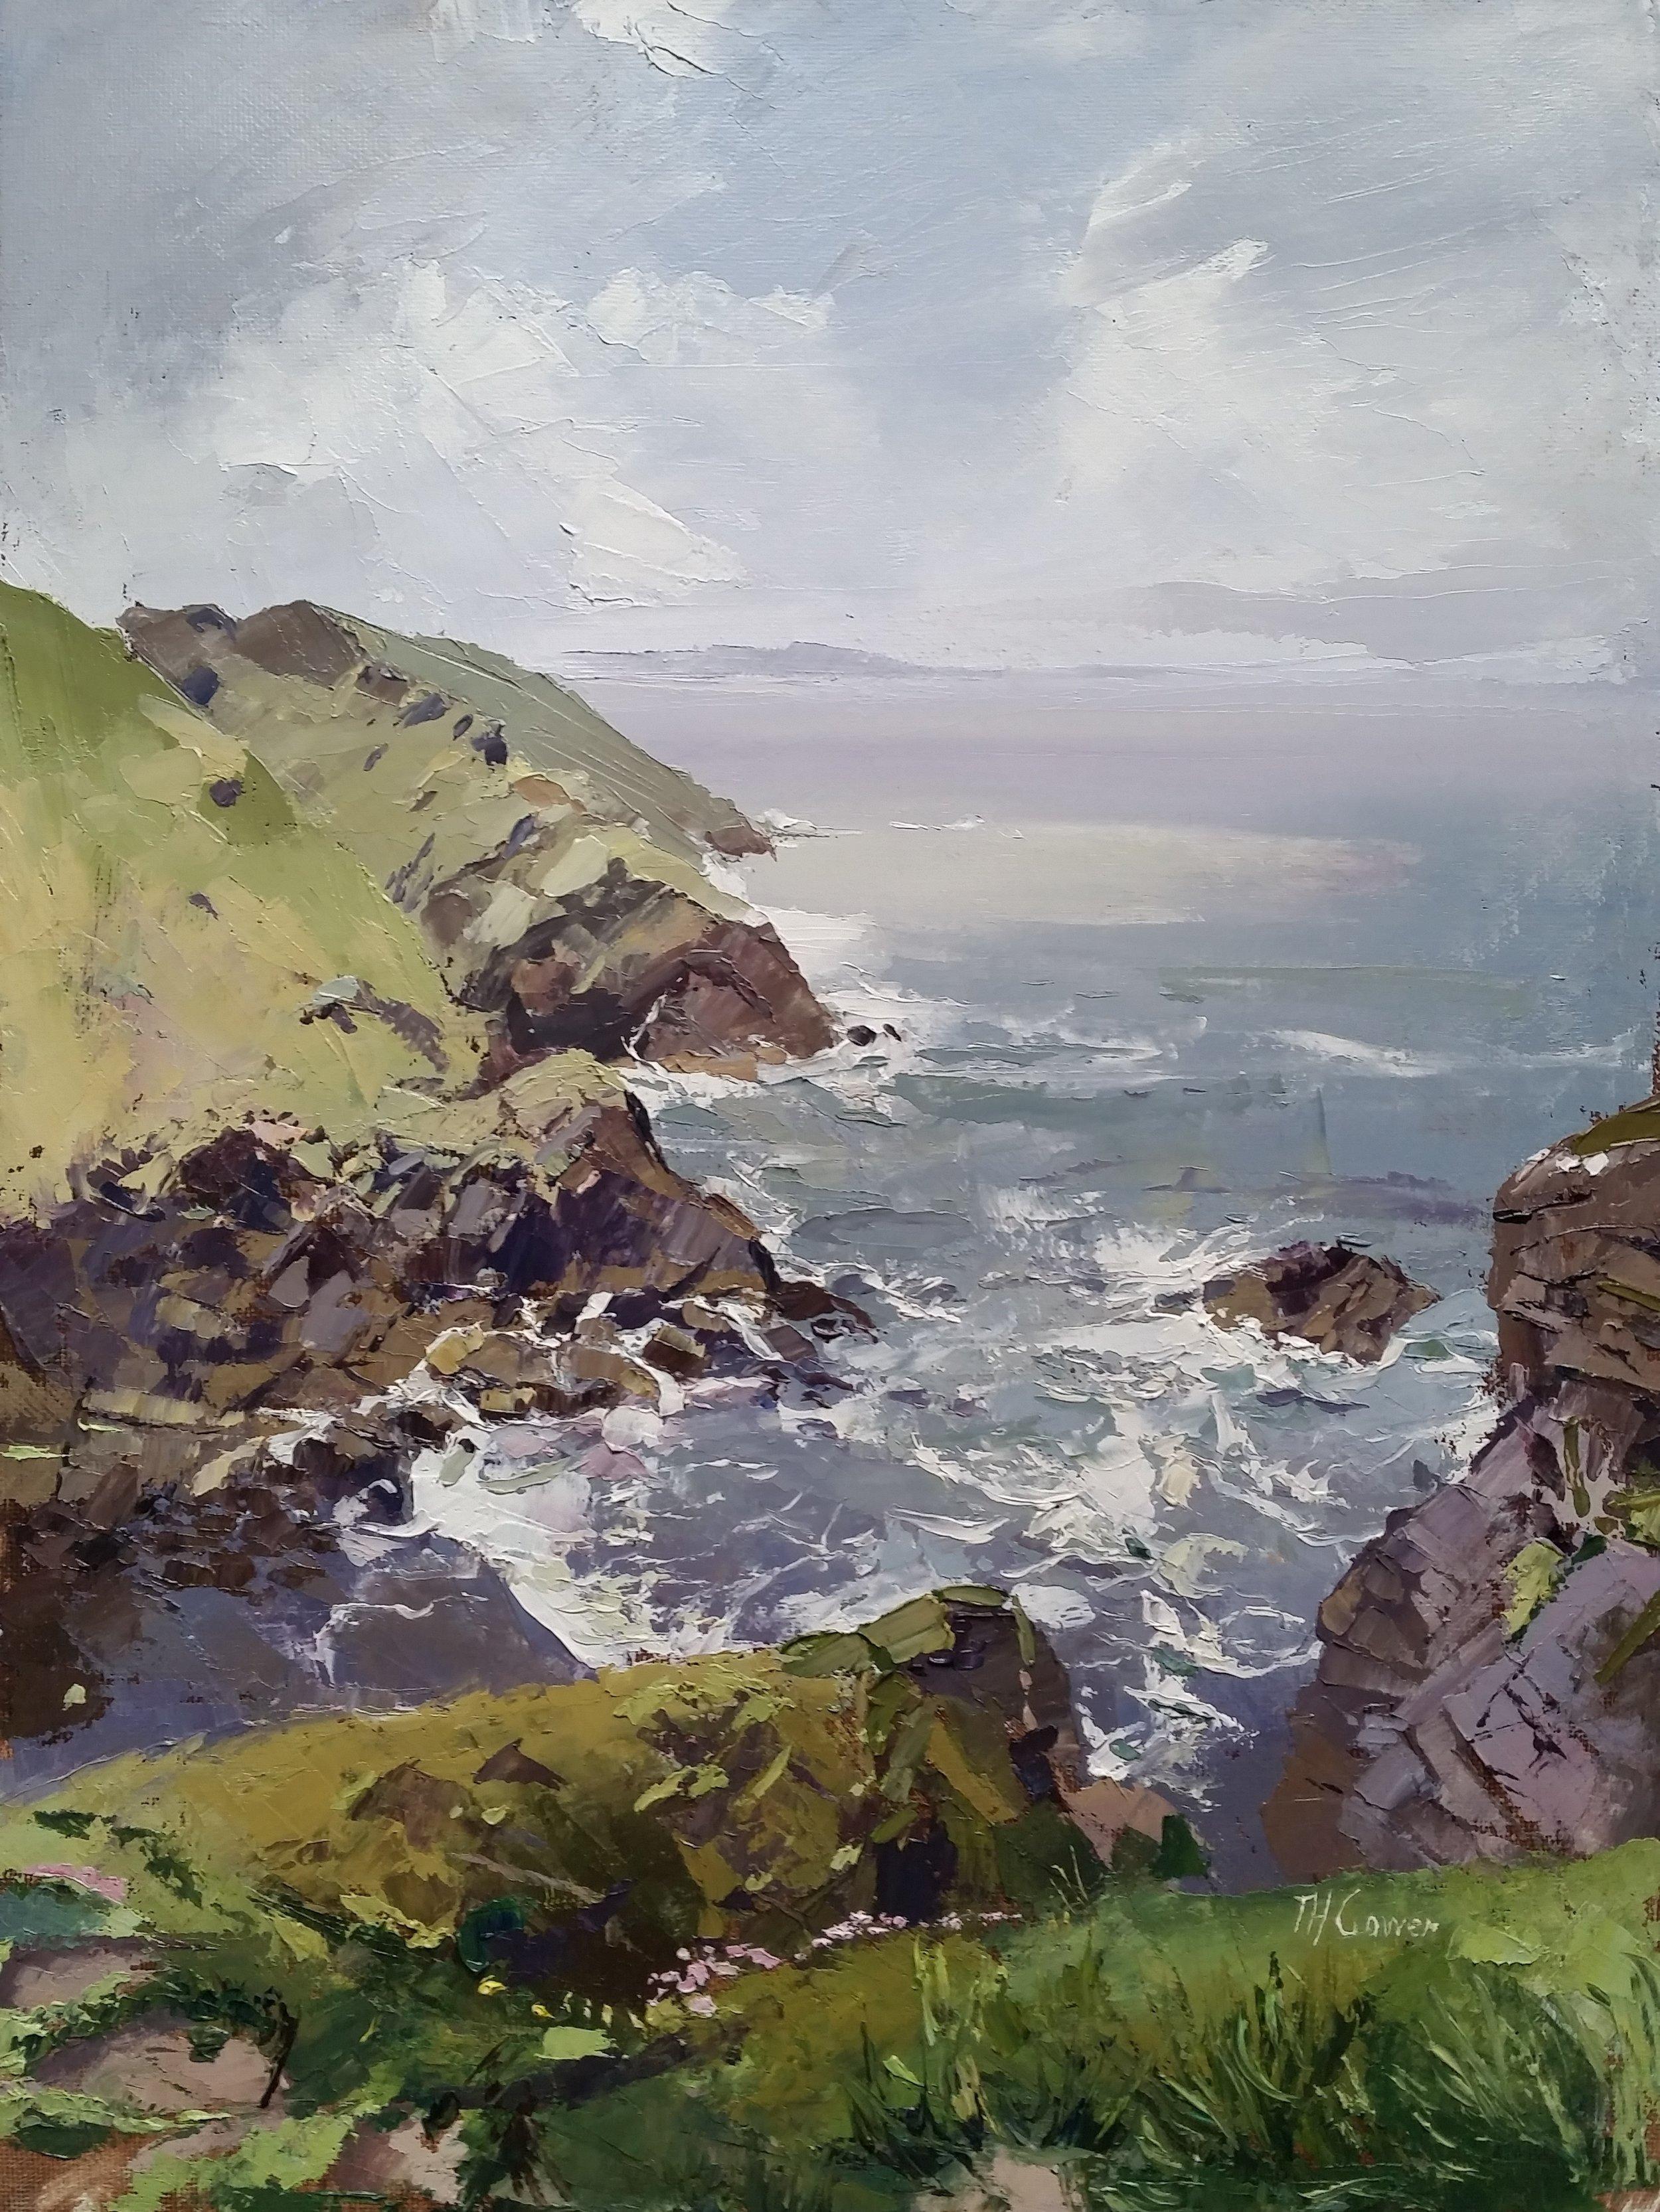 Cliffs Near Moylgrove by Tom Gowen